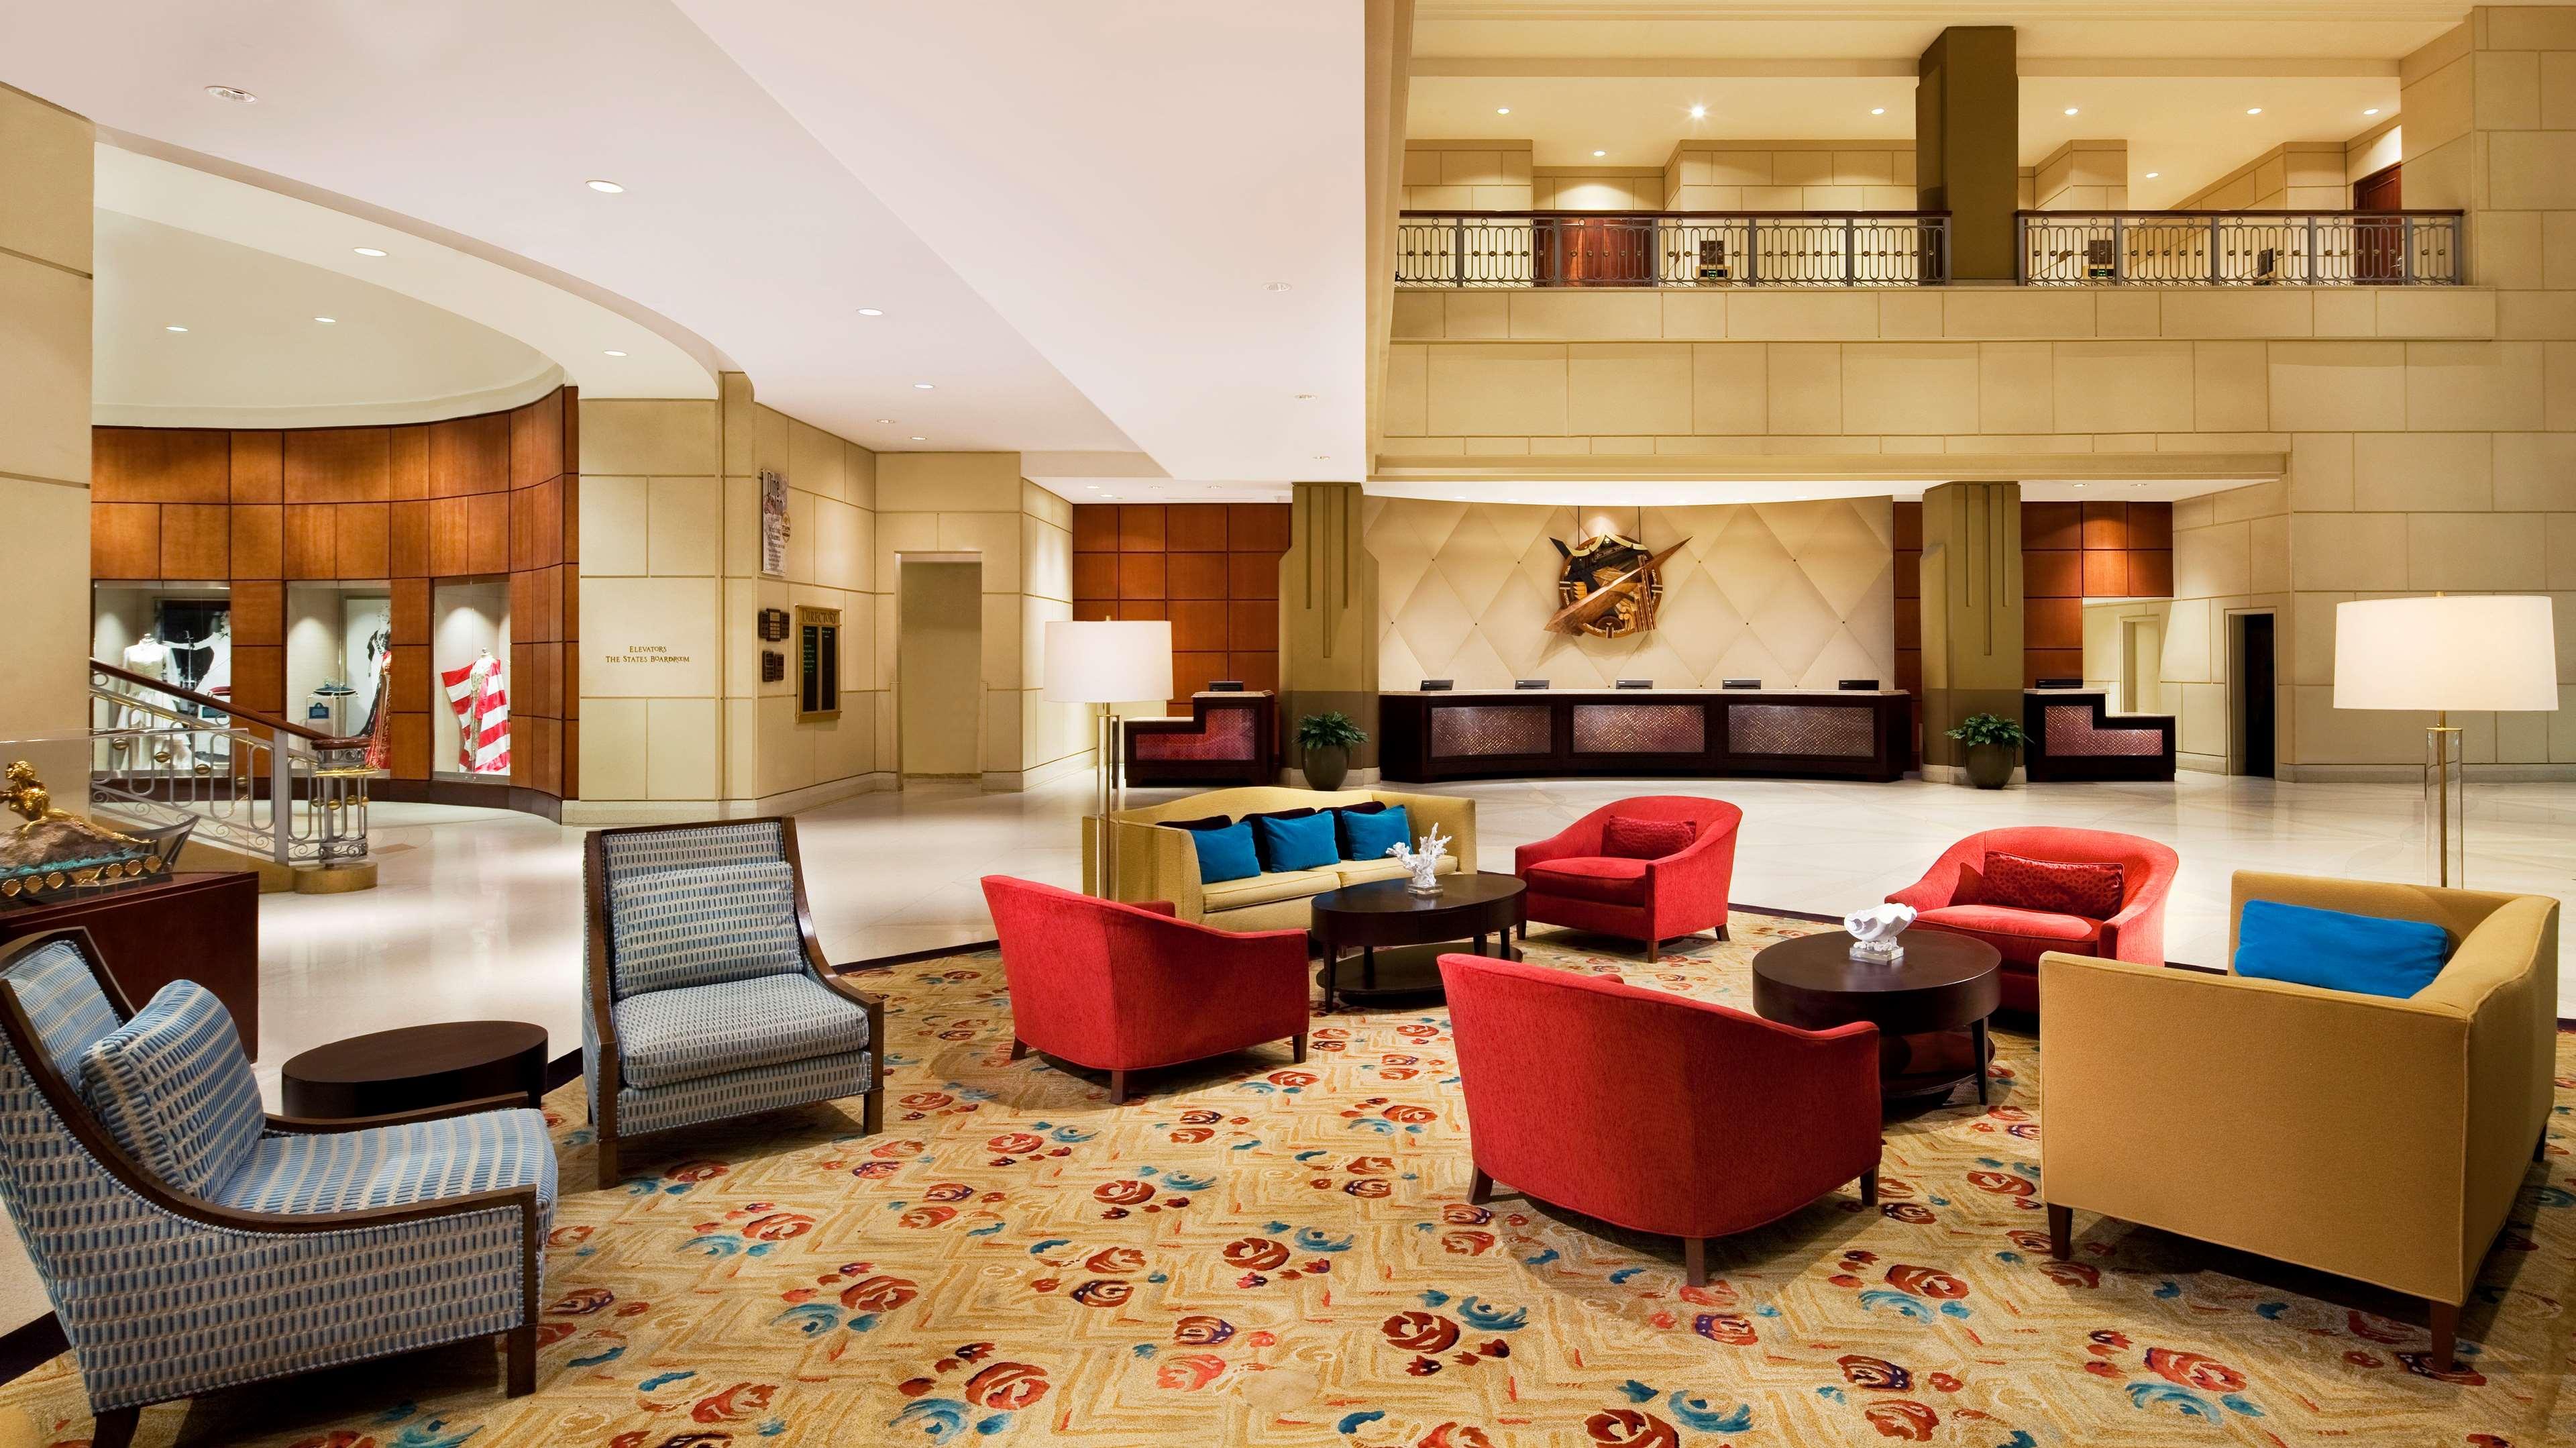 Sheraton Atlantic City Convention Center Hotel image 1